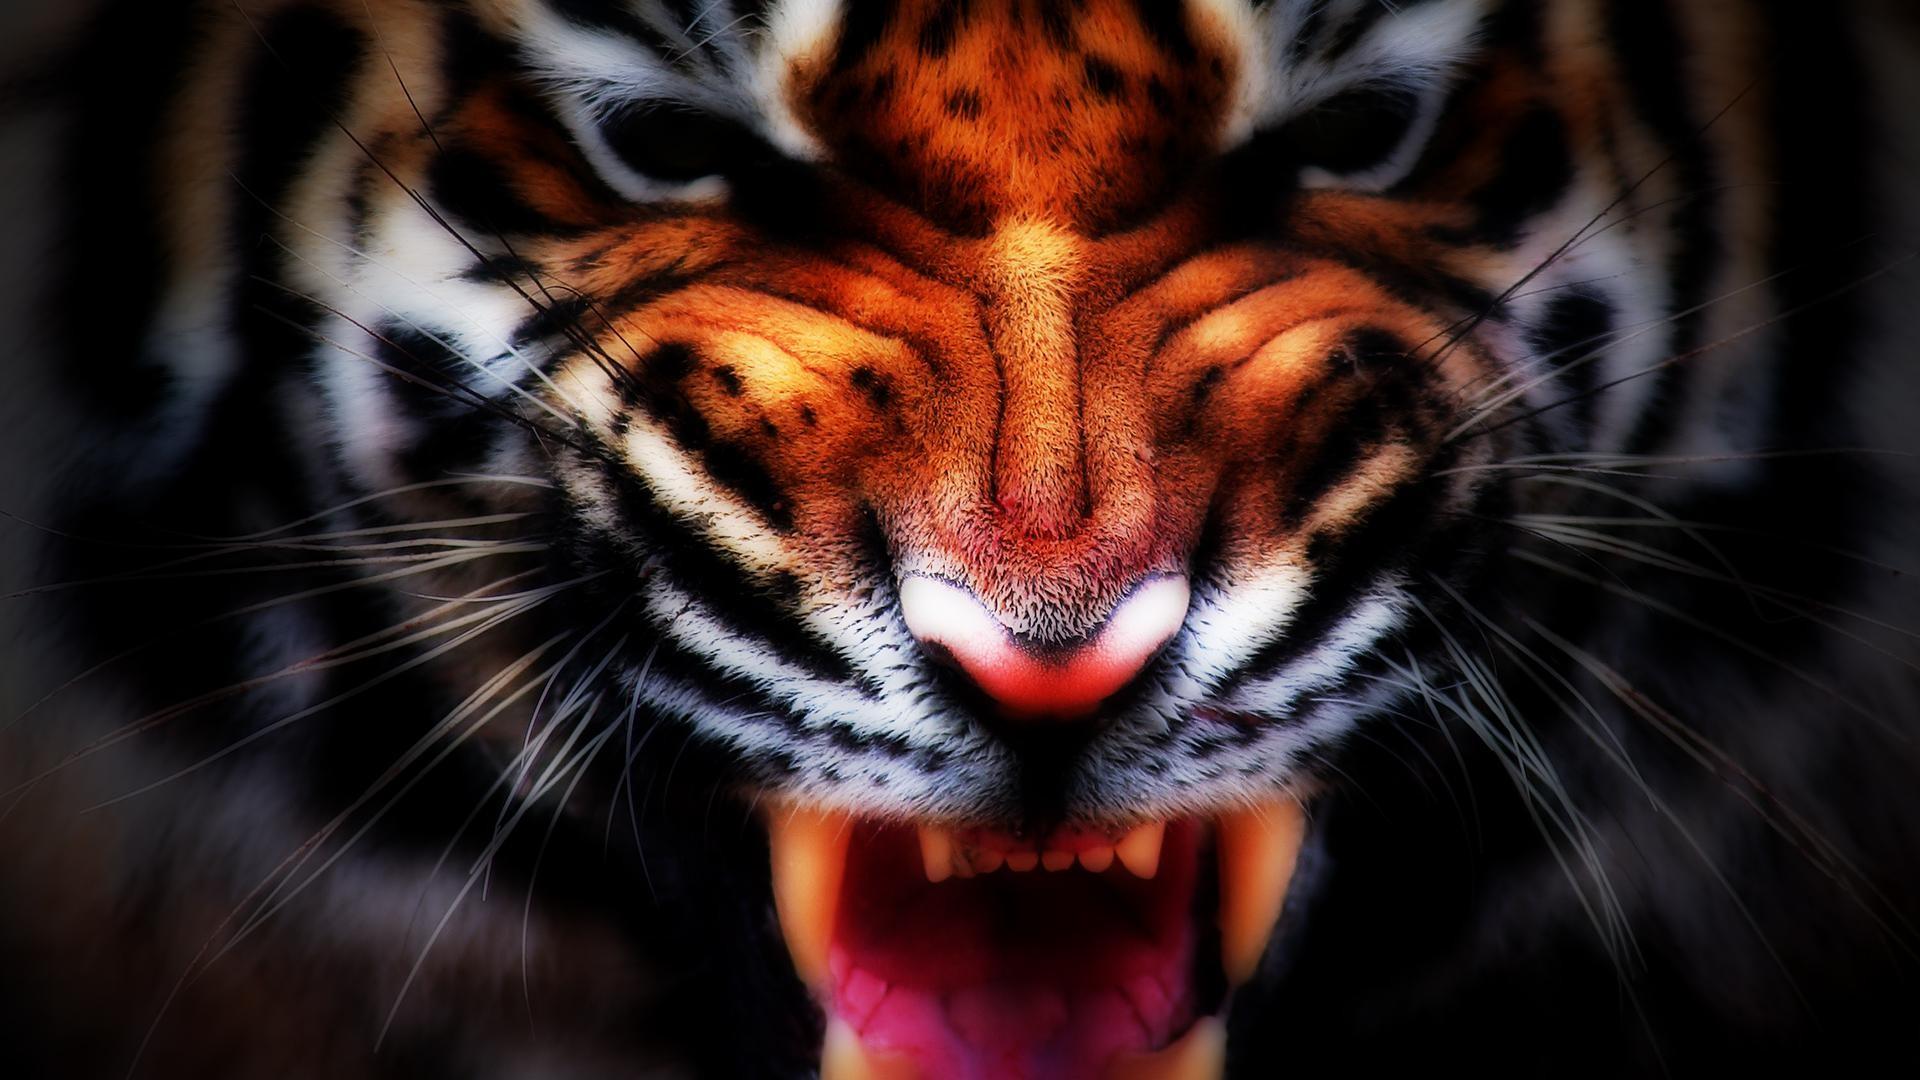 1920x1080 Tiger Iphone Wallpaper Download